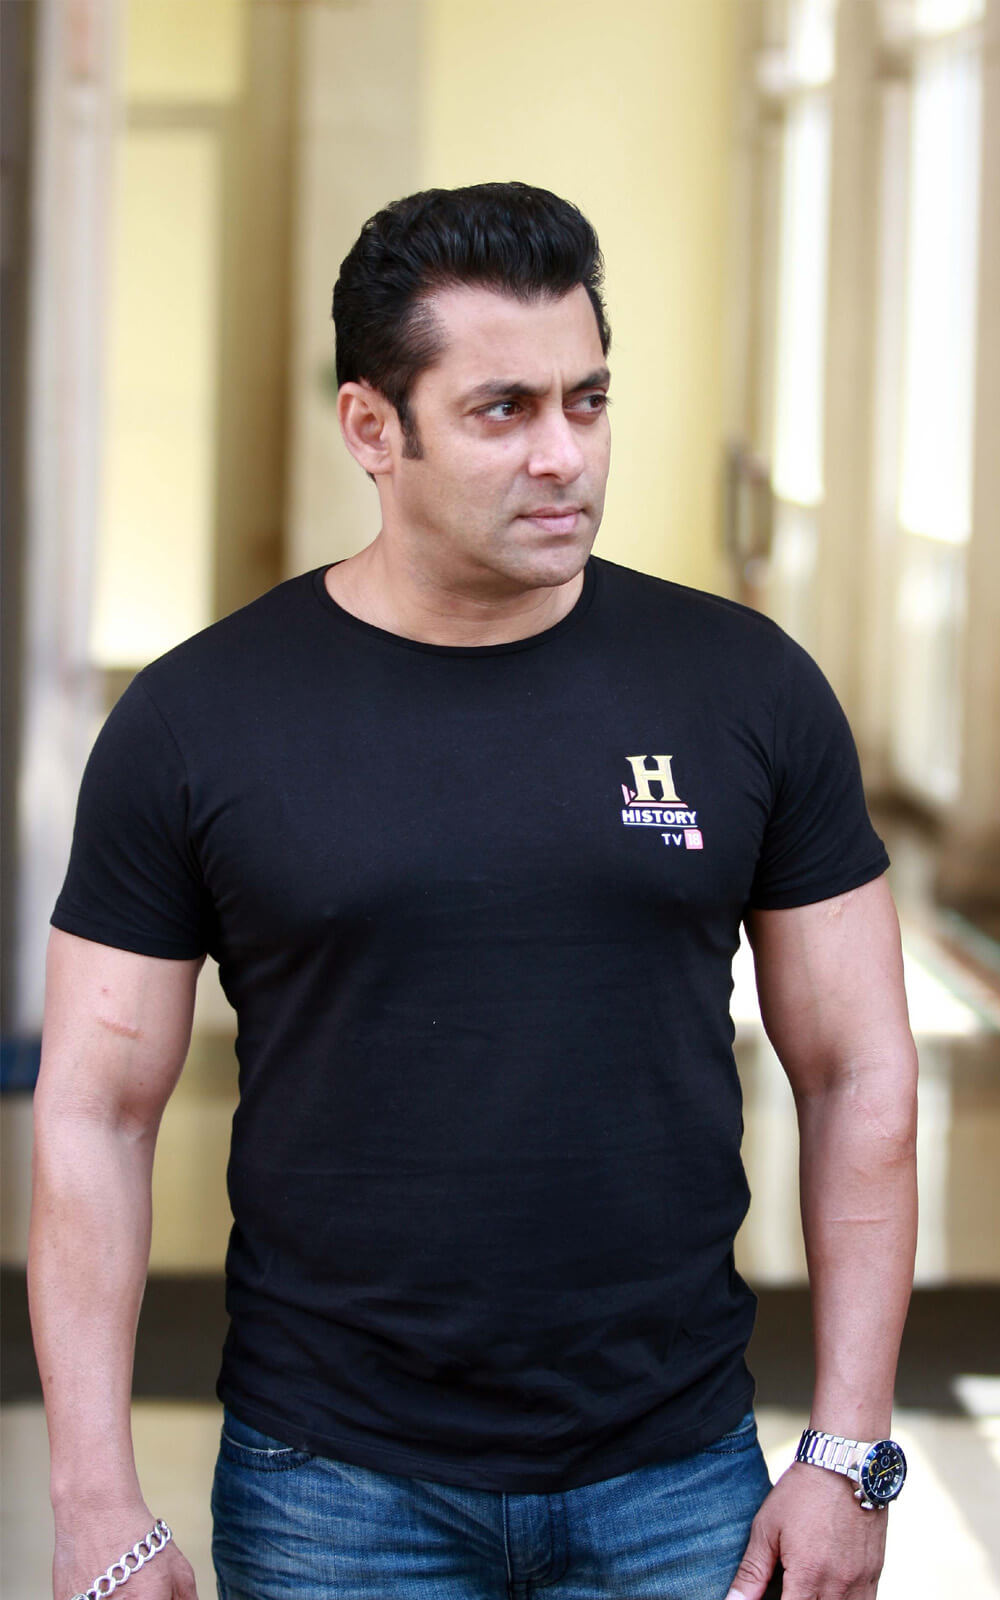 Salman Khan Photo, Age, News, Birthday, Height, Sister, Biography, Girlfriend, Awards, Address, Song, Video, Net Worth, Education, Twitter, Instagram, Facebook, Wiki, Imdb, Website, Youtube (30)